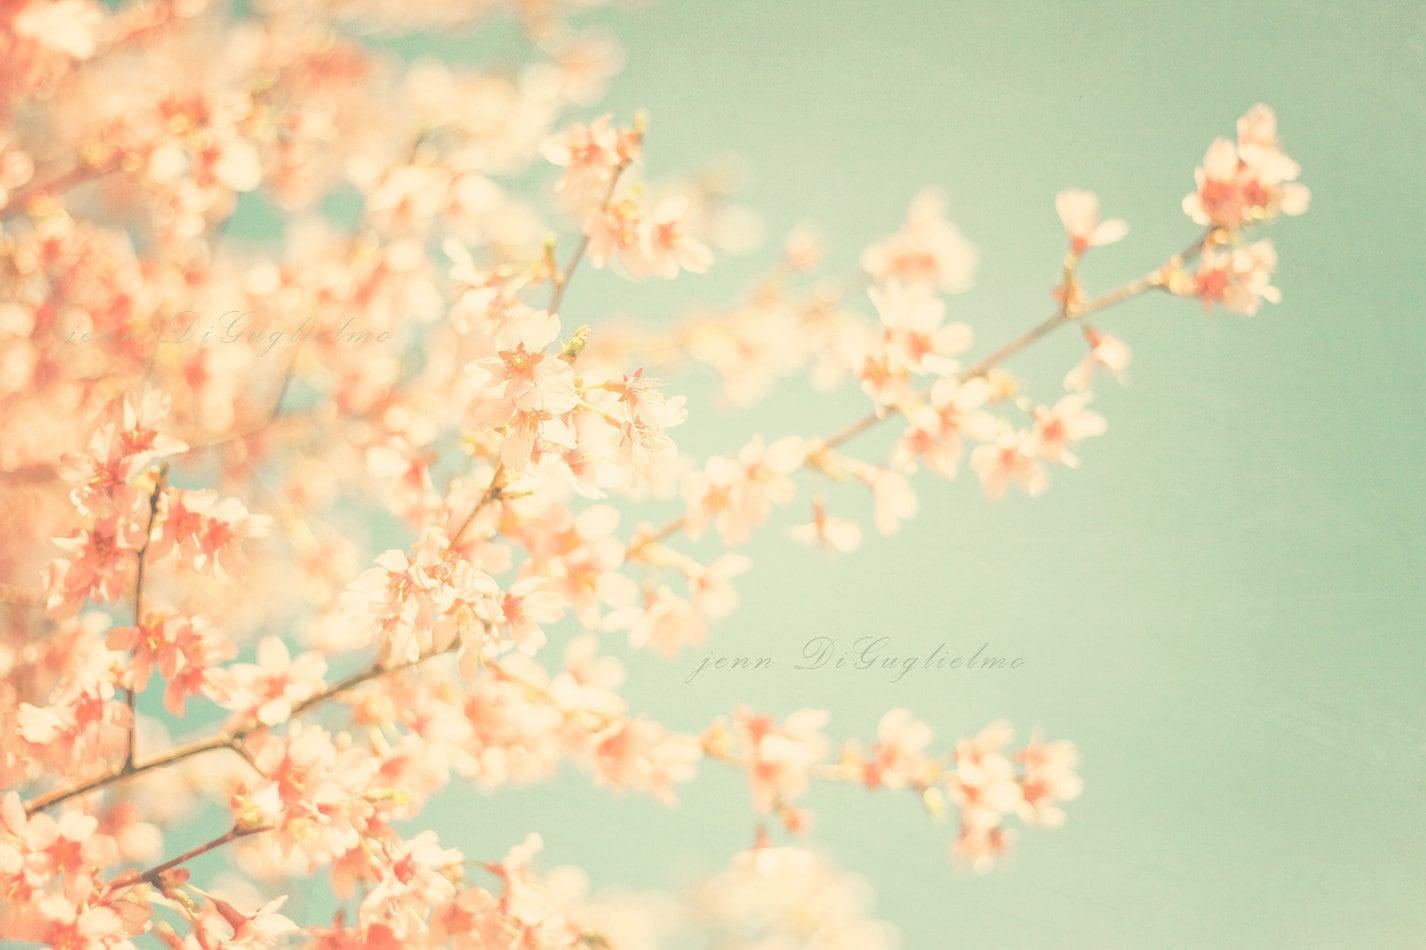 Spring flowers Fine art photography cottage by JennDiGuglielmo